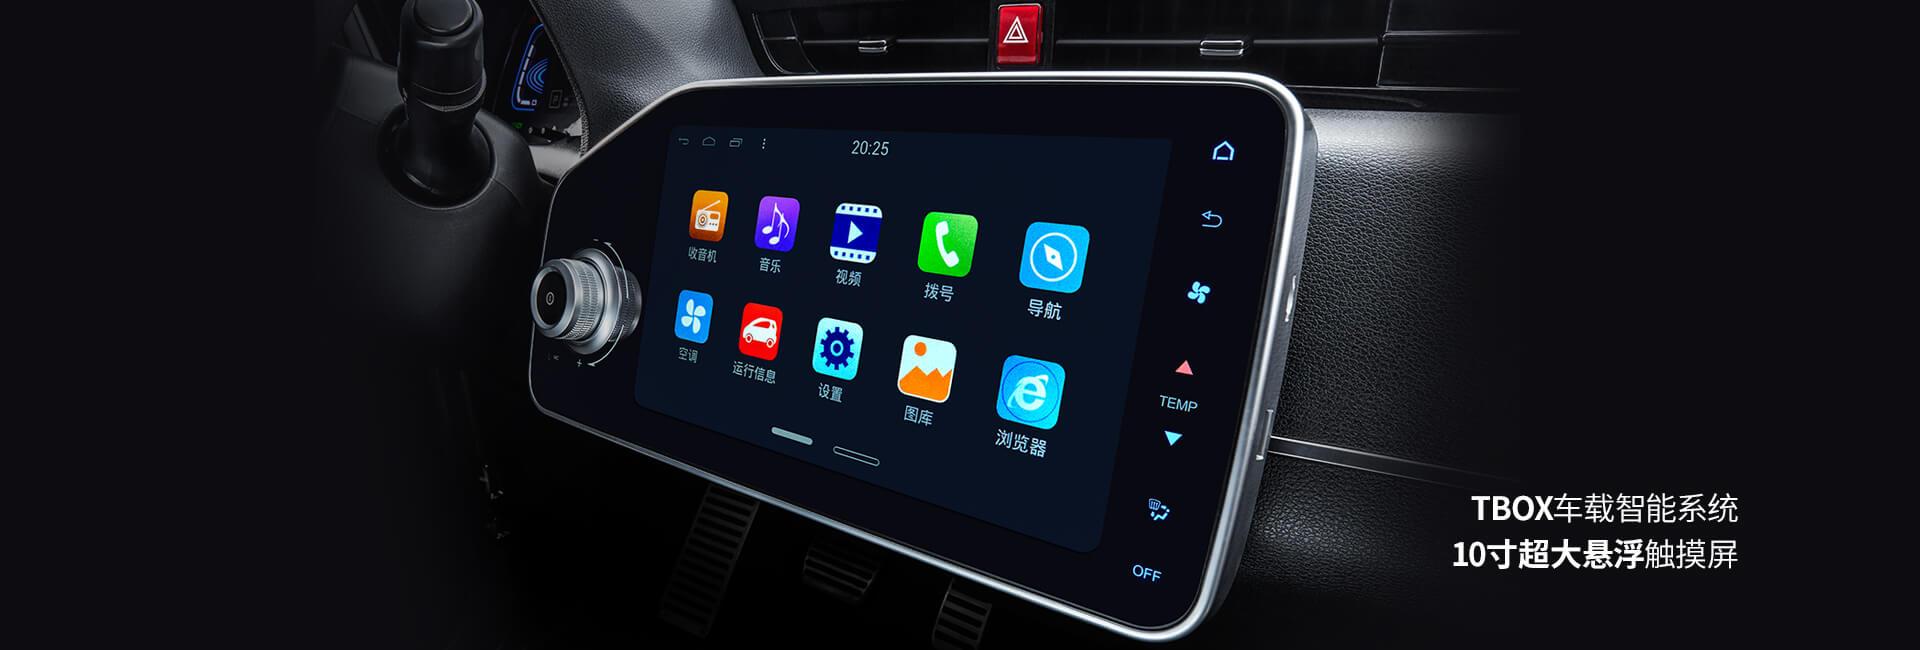 TBOX车载智能系统